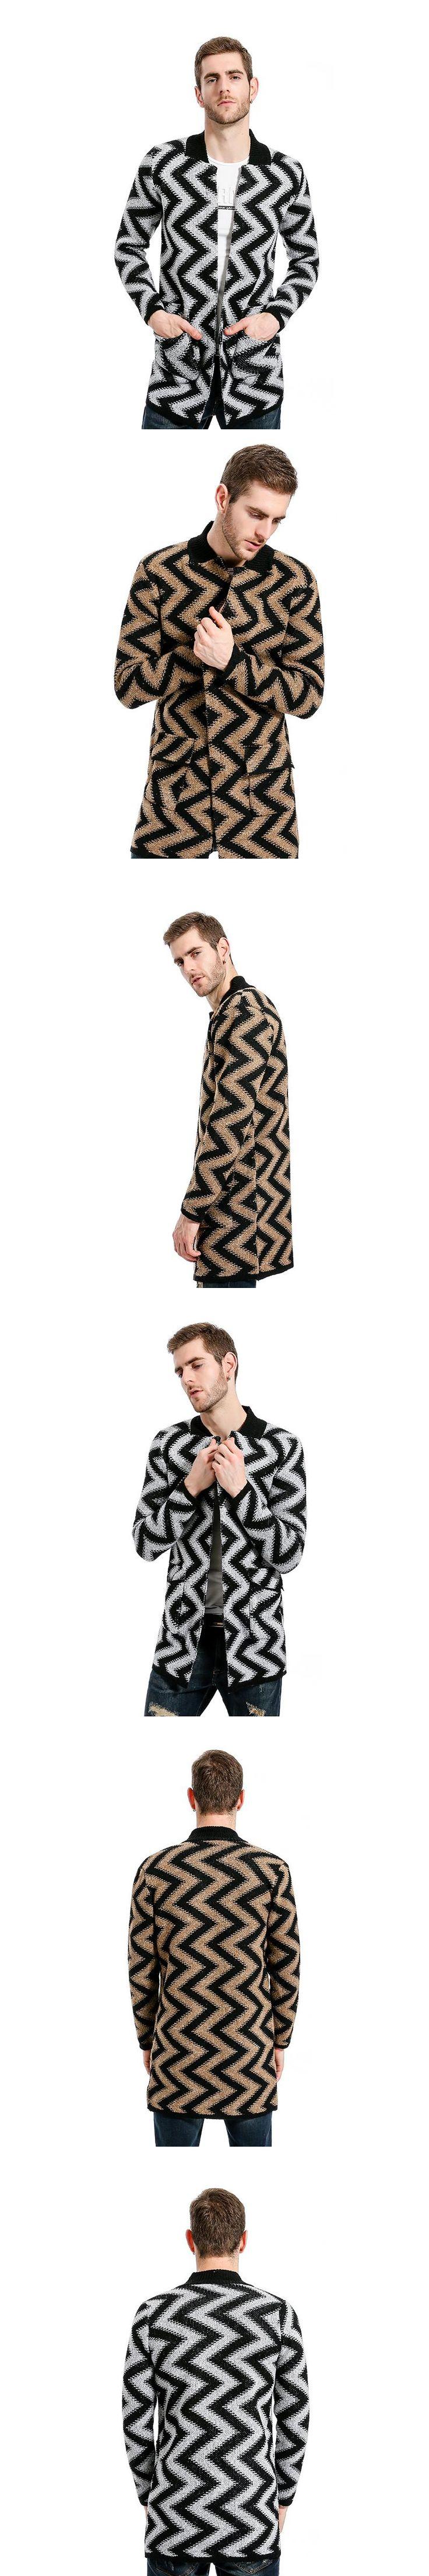 Men Striped Long Trench Coat Men Wavy Pattern Designer Stand Collar Jacket Overcoat XXL Slim Fit Male Cardigan Windbreaker